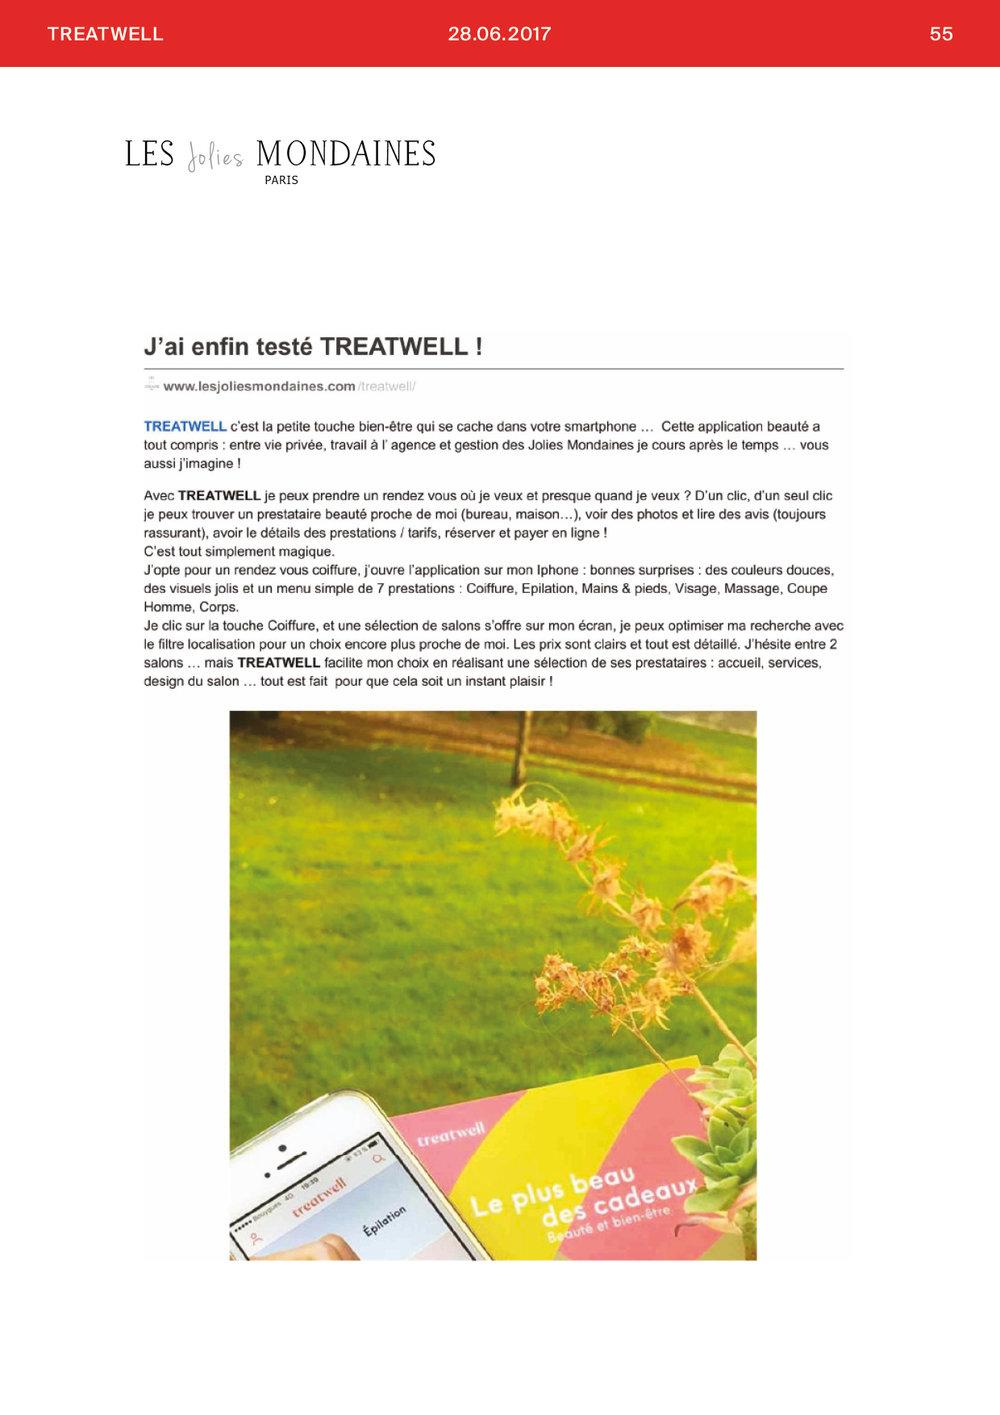 BOOKMEDIA_MAI_055.jpg